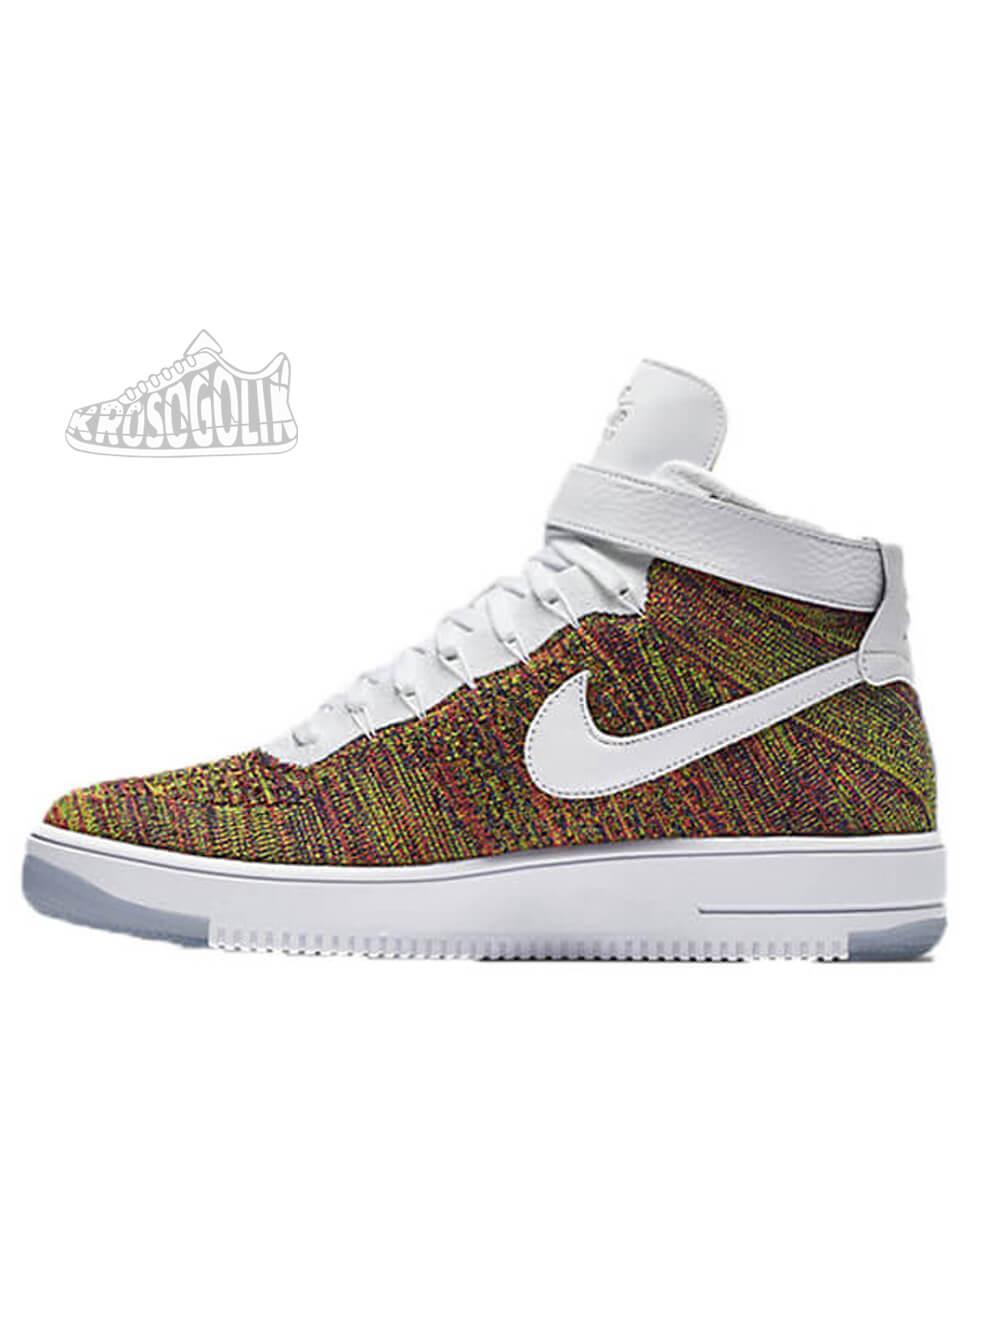 1ef8d2280e64b9 Купить мужские кроссовки Nike Air Force 1 Ultra Flyknit Mid ...